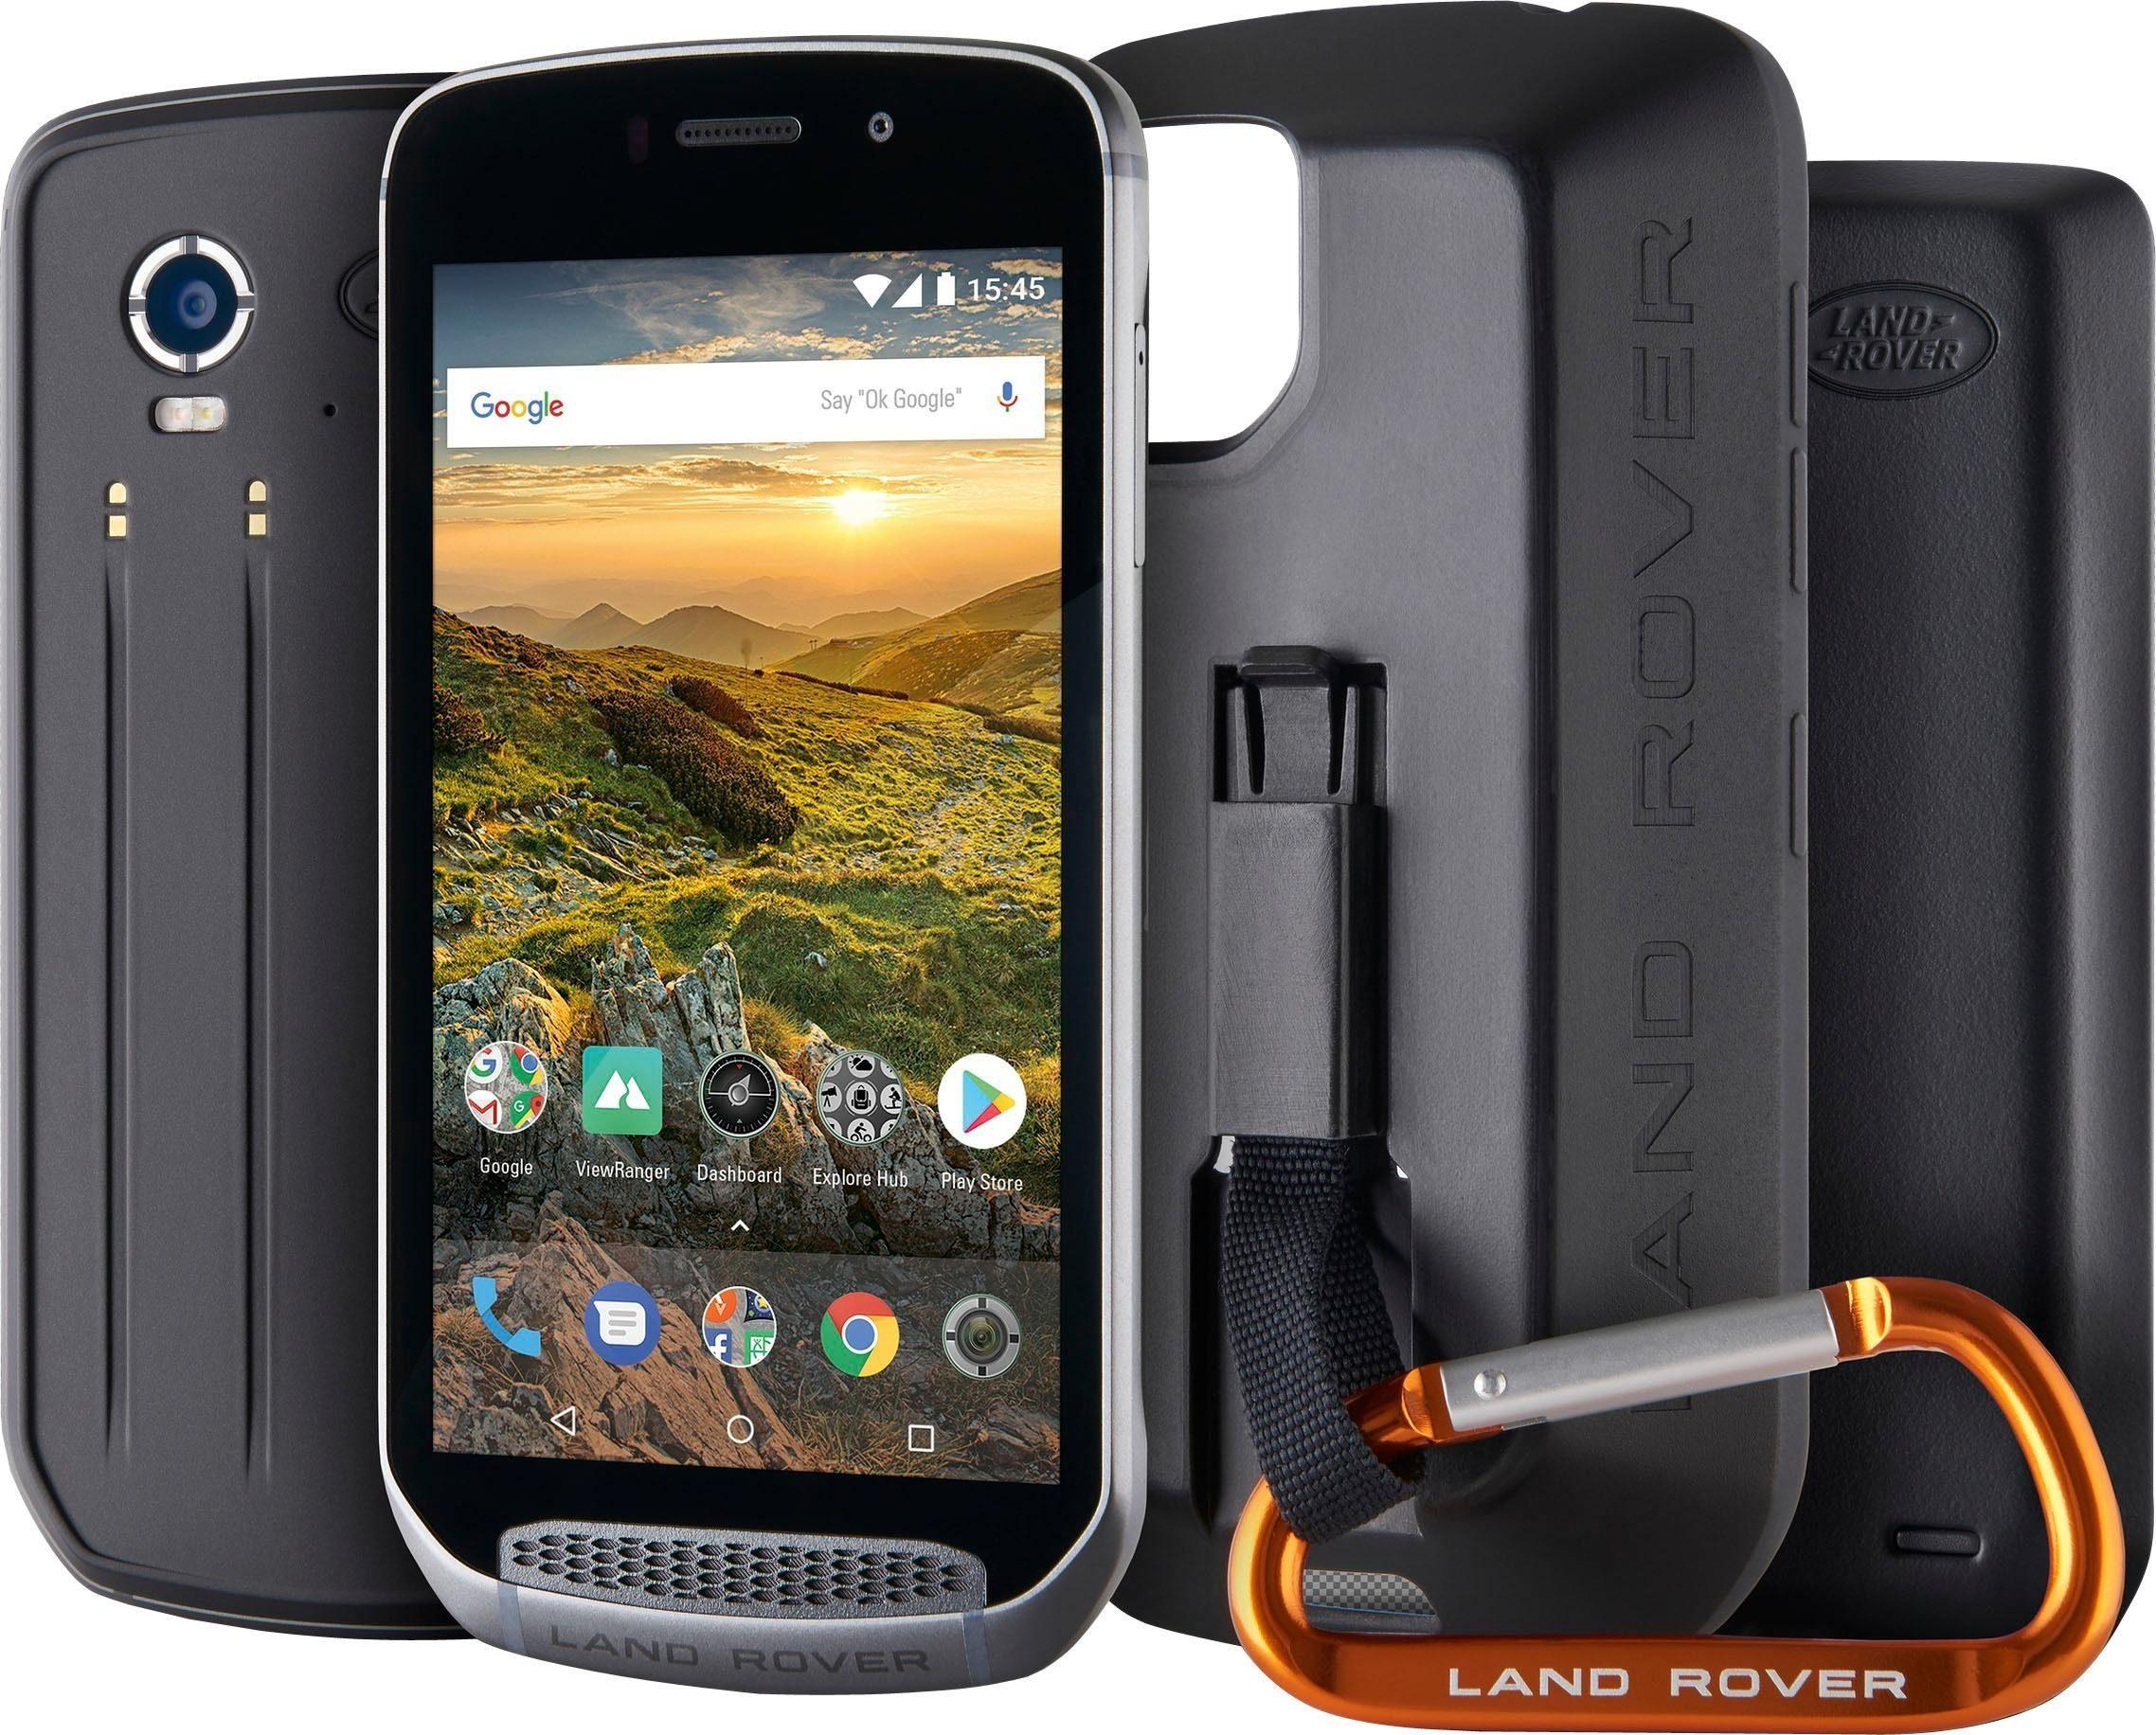 Landrover Explore Outdoor inkl. Adventure Pack (3340mAh Powerbank, GPS Verstärker, Schutzhülle). Smartphone (12,5 cm/5 Zoll, 64 GB Speicherplatz, 16 MP Kamera)